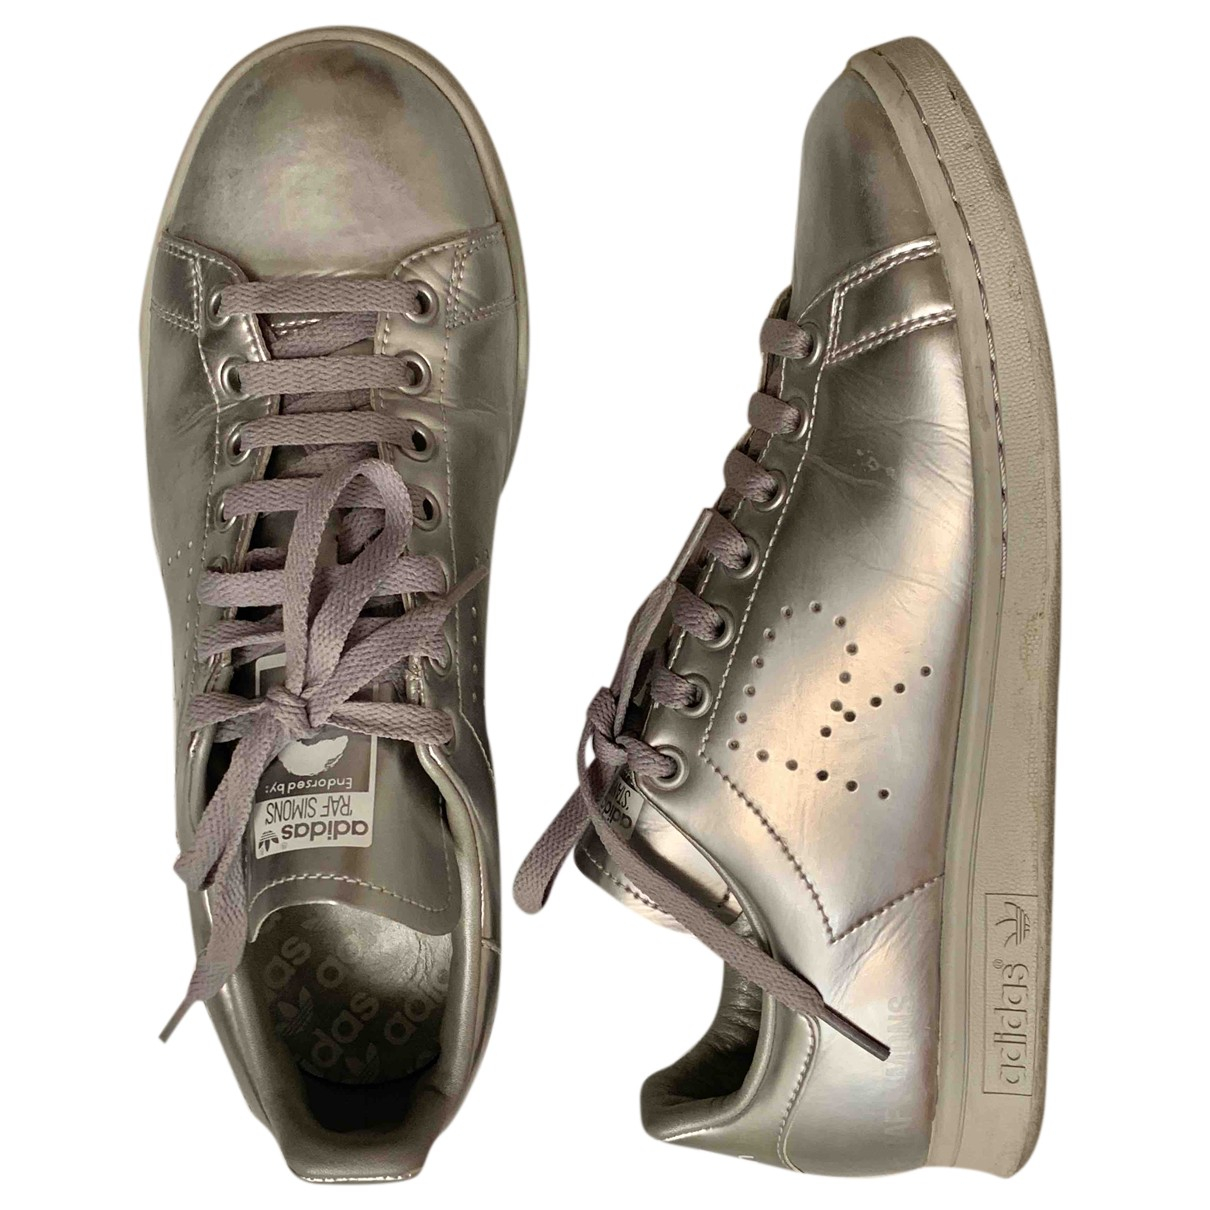 Adidas X Raf Simons Stan Smith Silver Leather Trainers for Men 42 EU